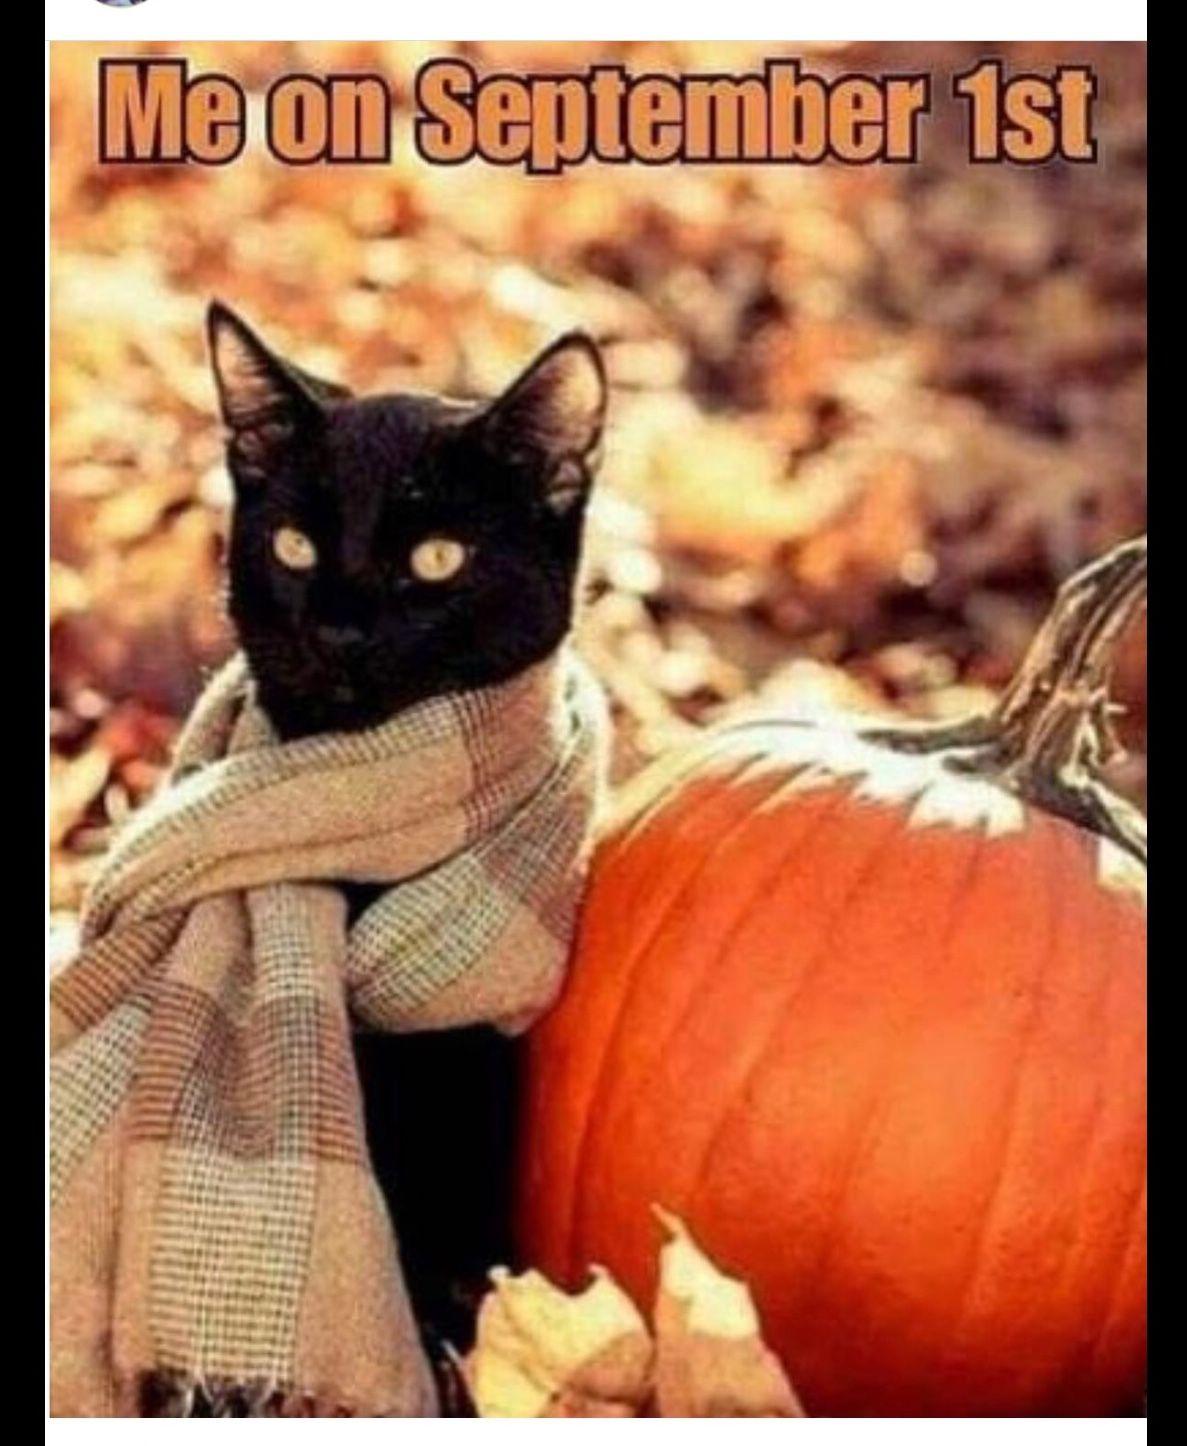 Pin by Terri Christensen Buckner on Halloween/Thanksgiving